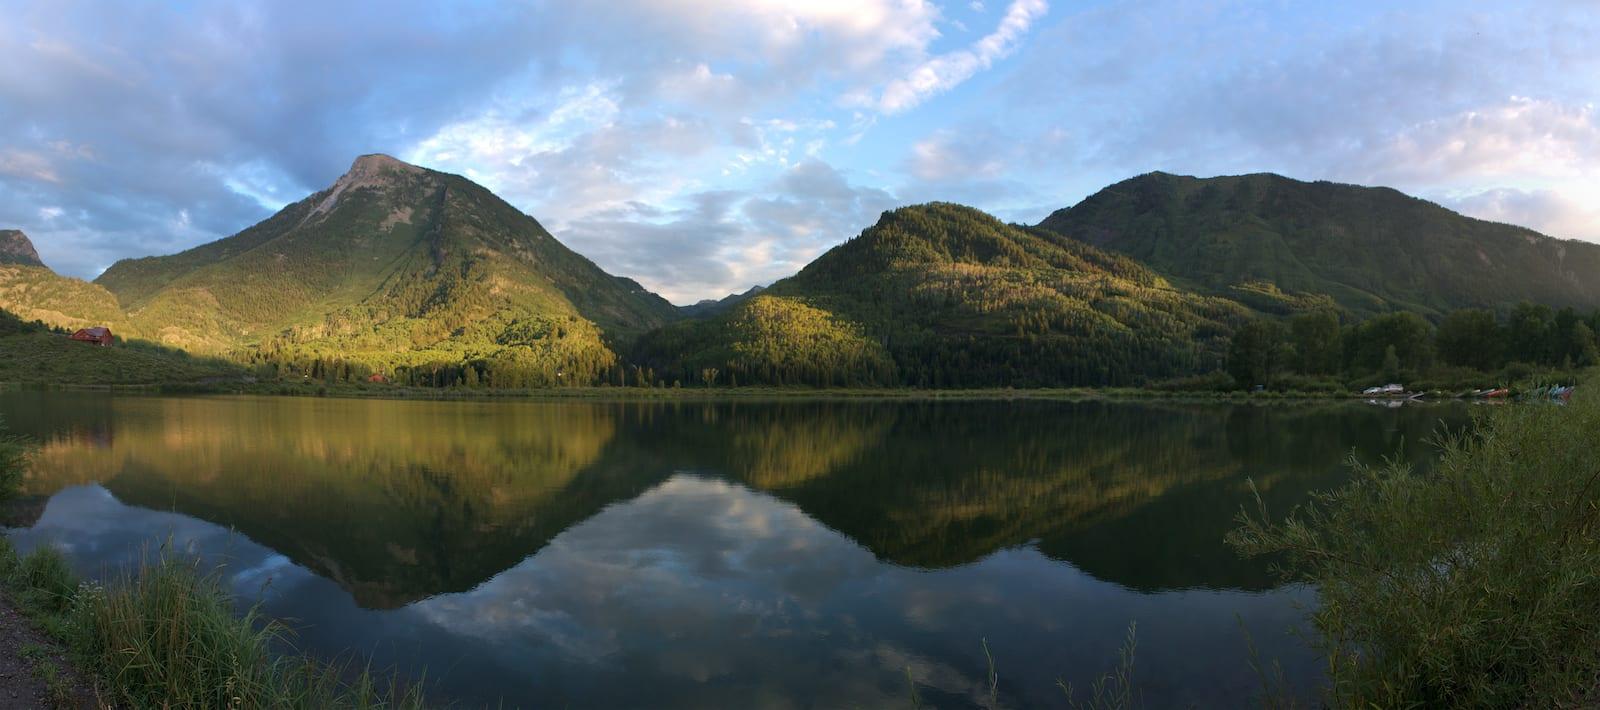 Beaver Lake in Marble, Colorado